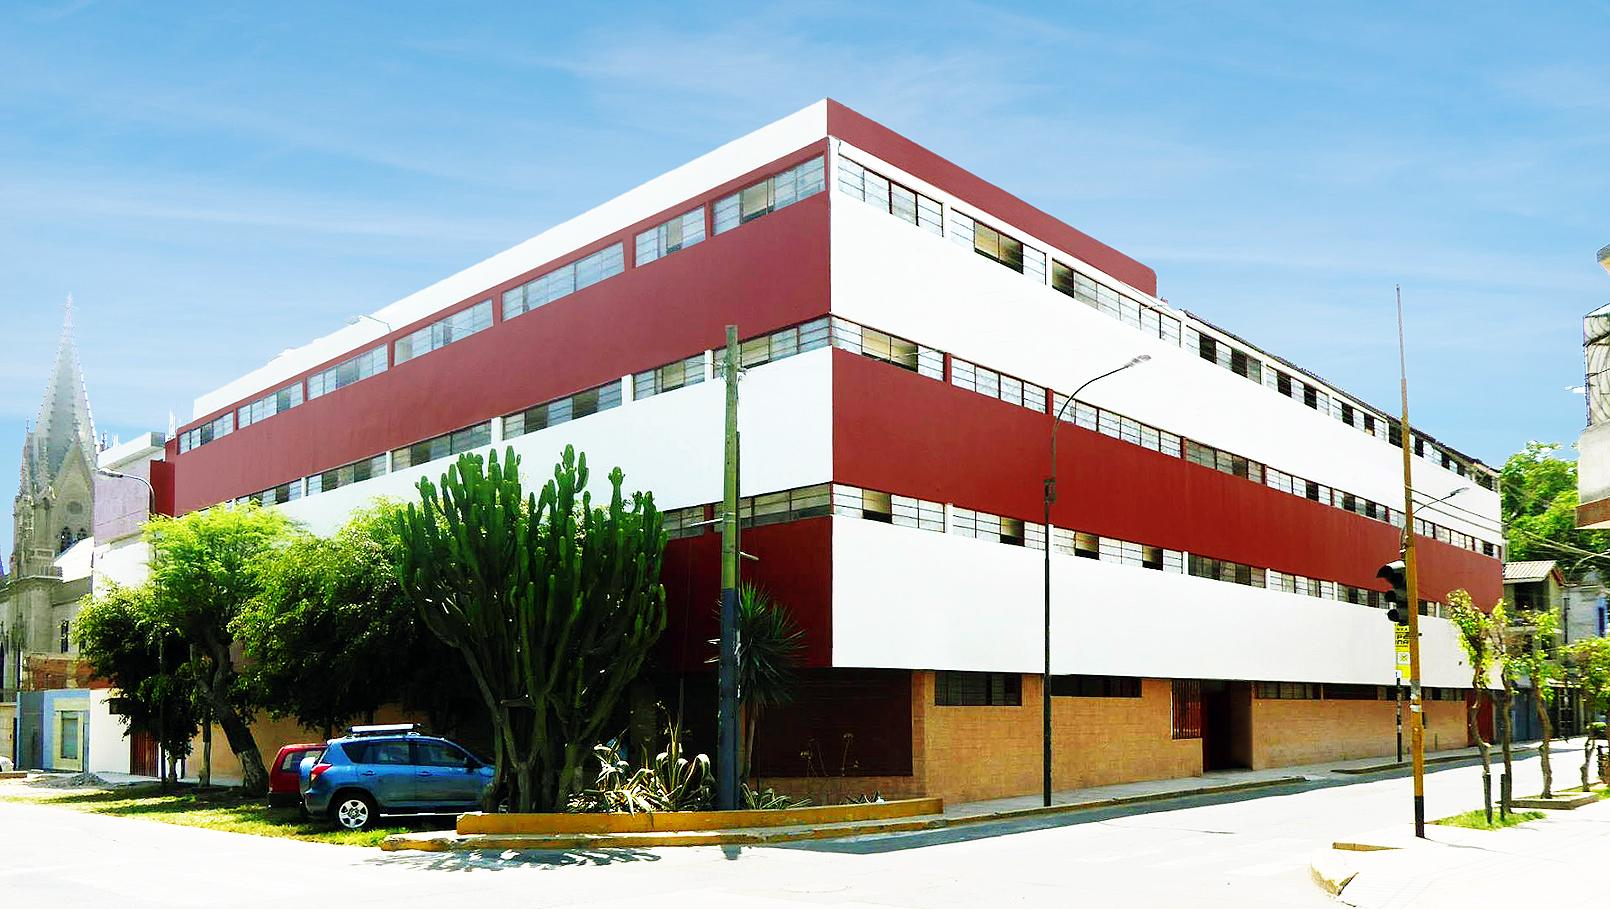 Local central: Calle Enrique Villar 675 (Cruce con Jr. Torres Paz) Santa Beatriz, Lima.